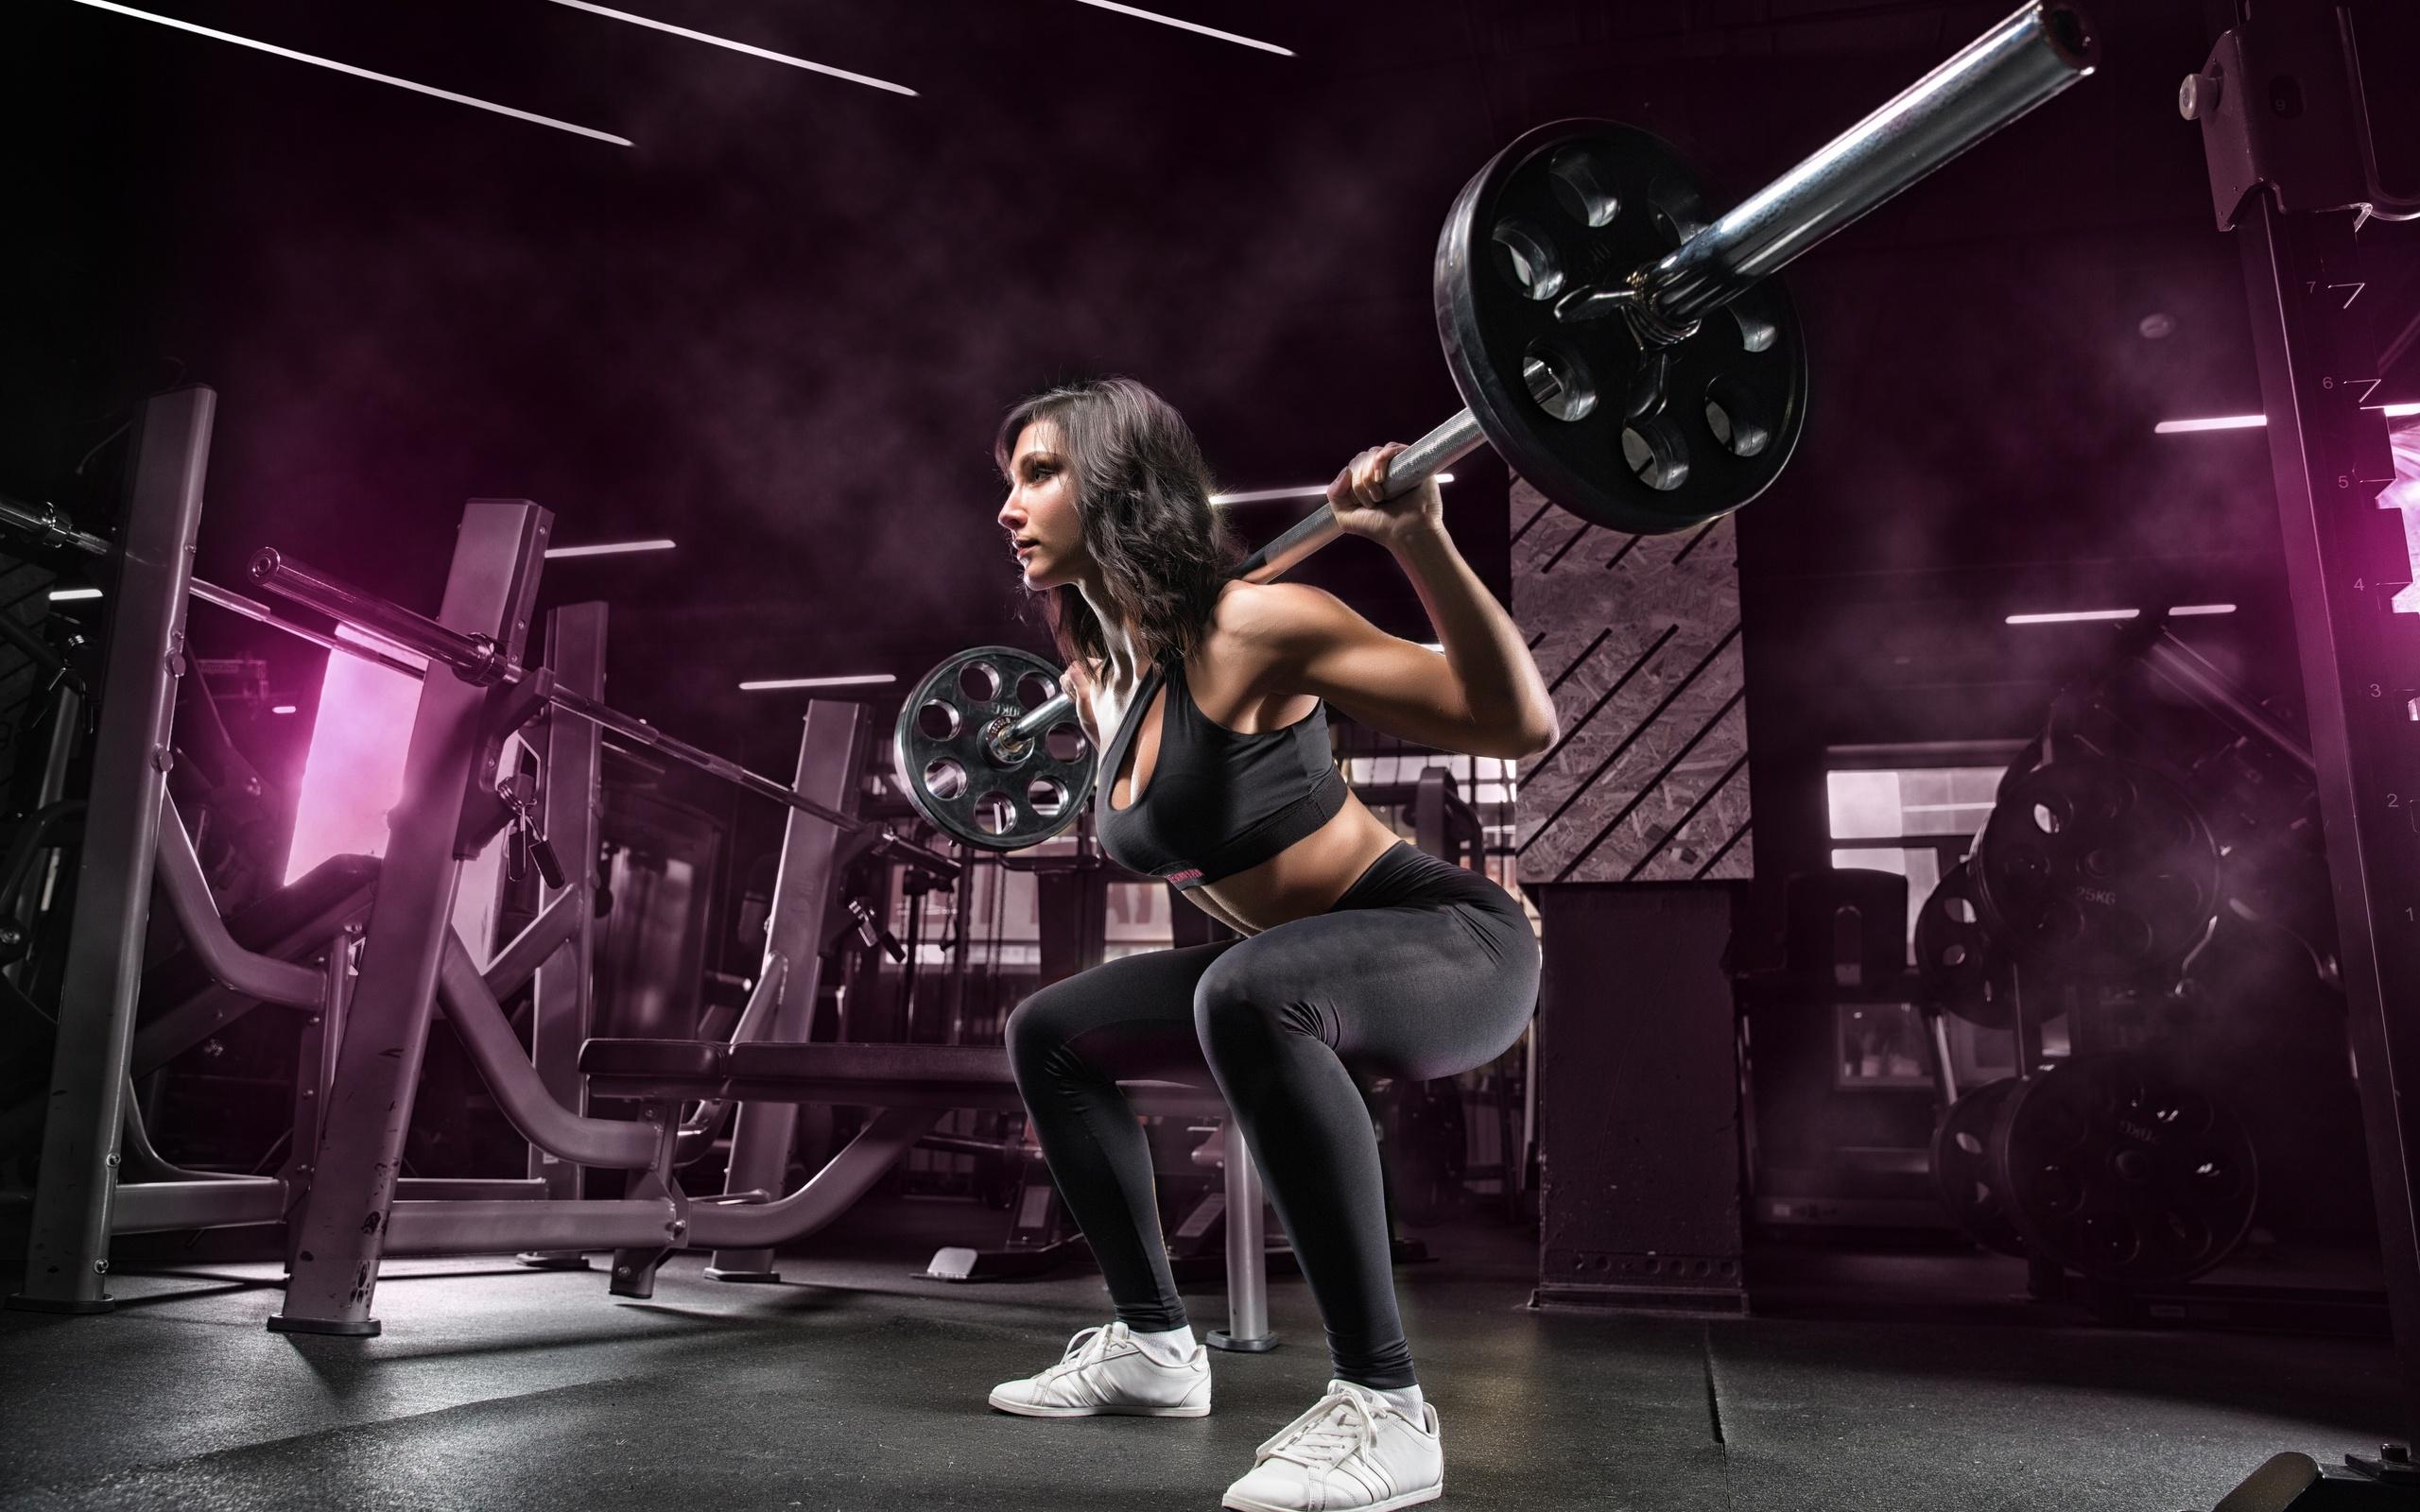 фитнес, спортзал, тренировка